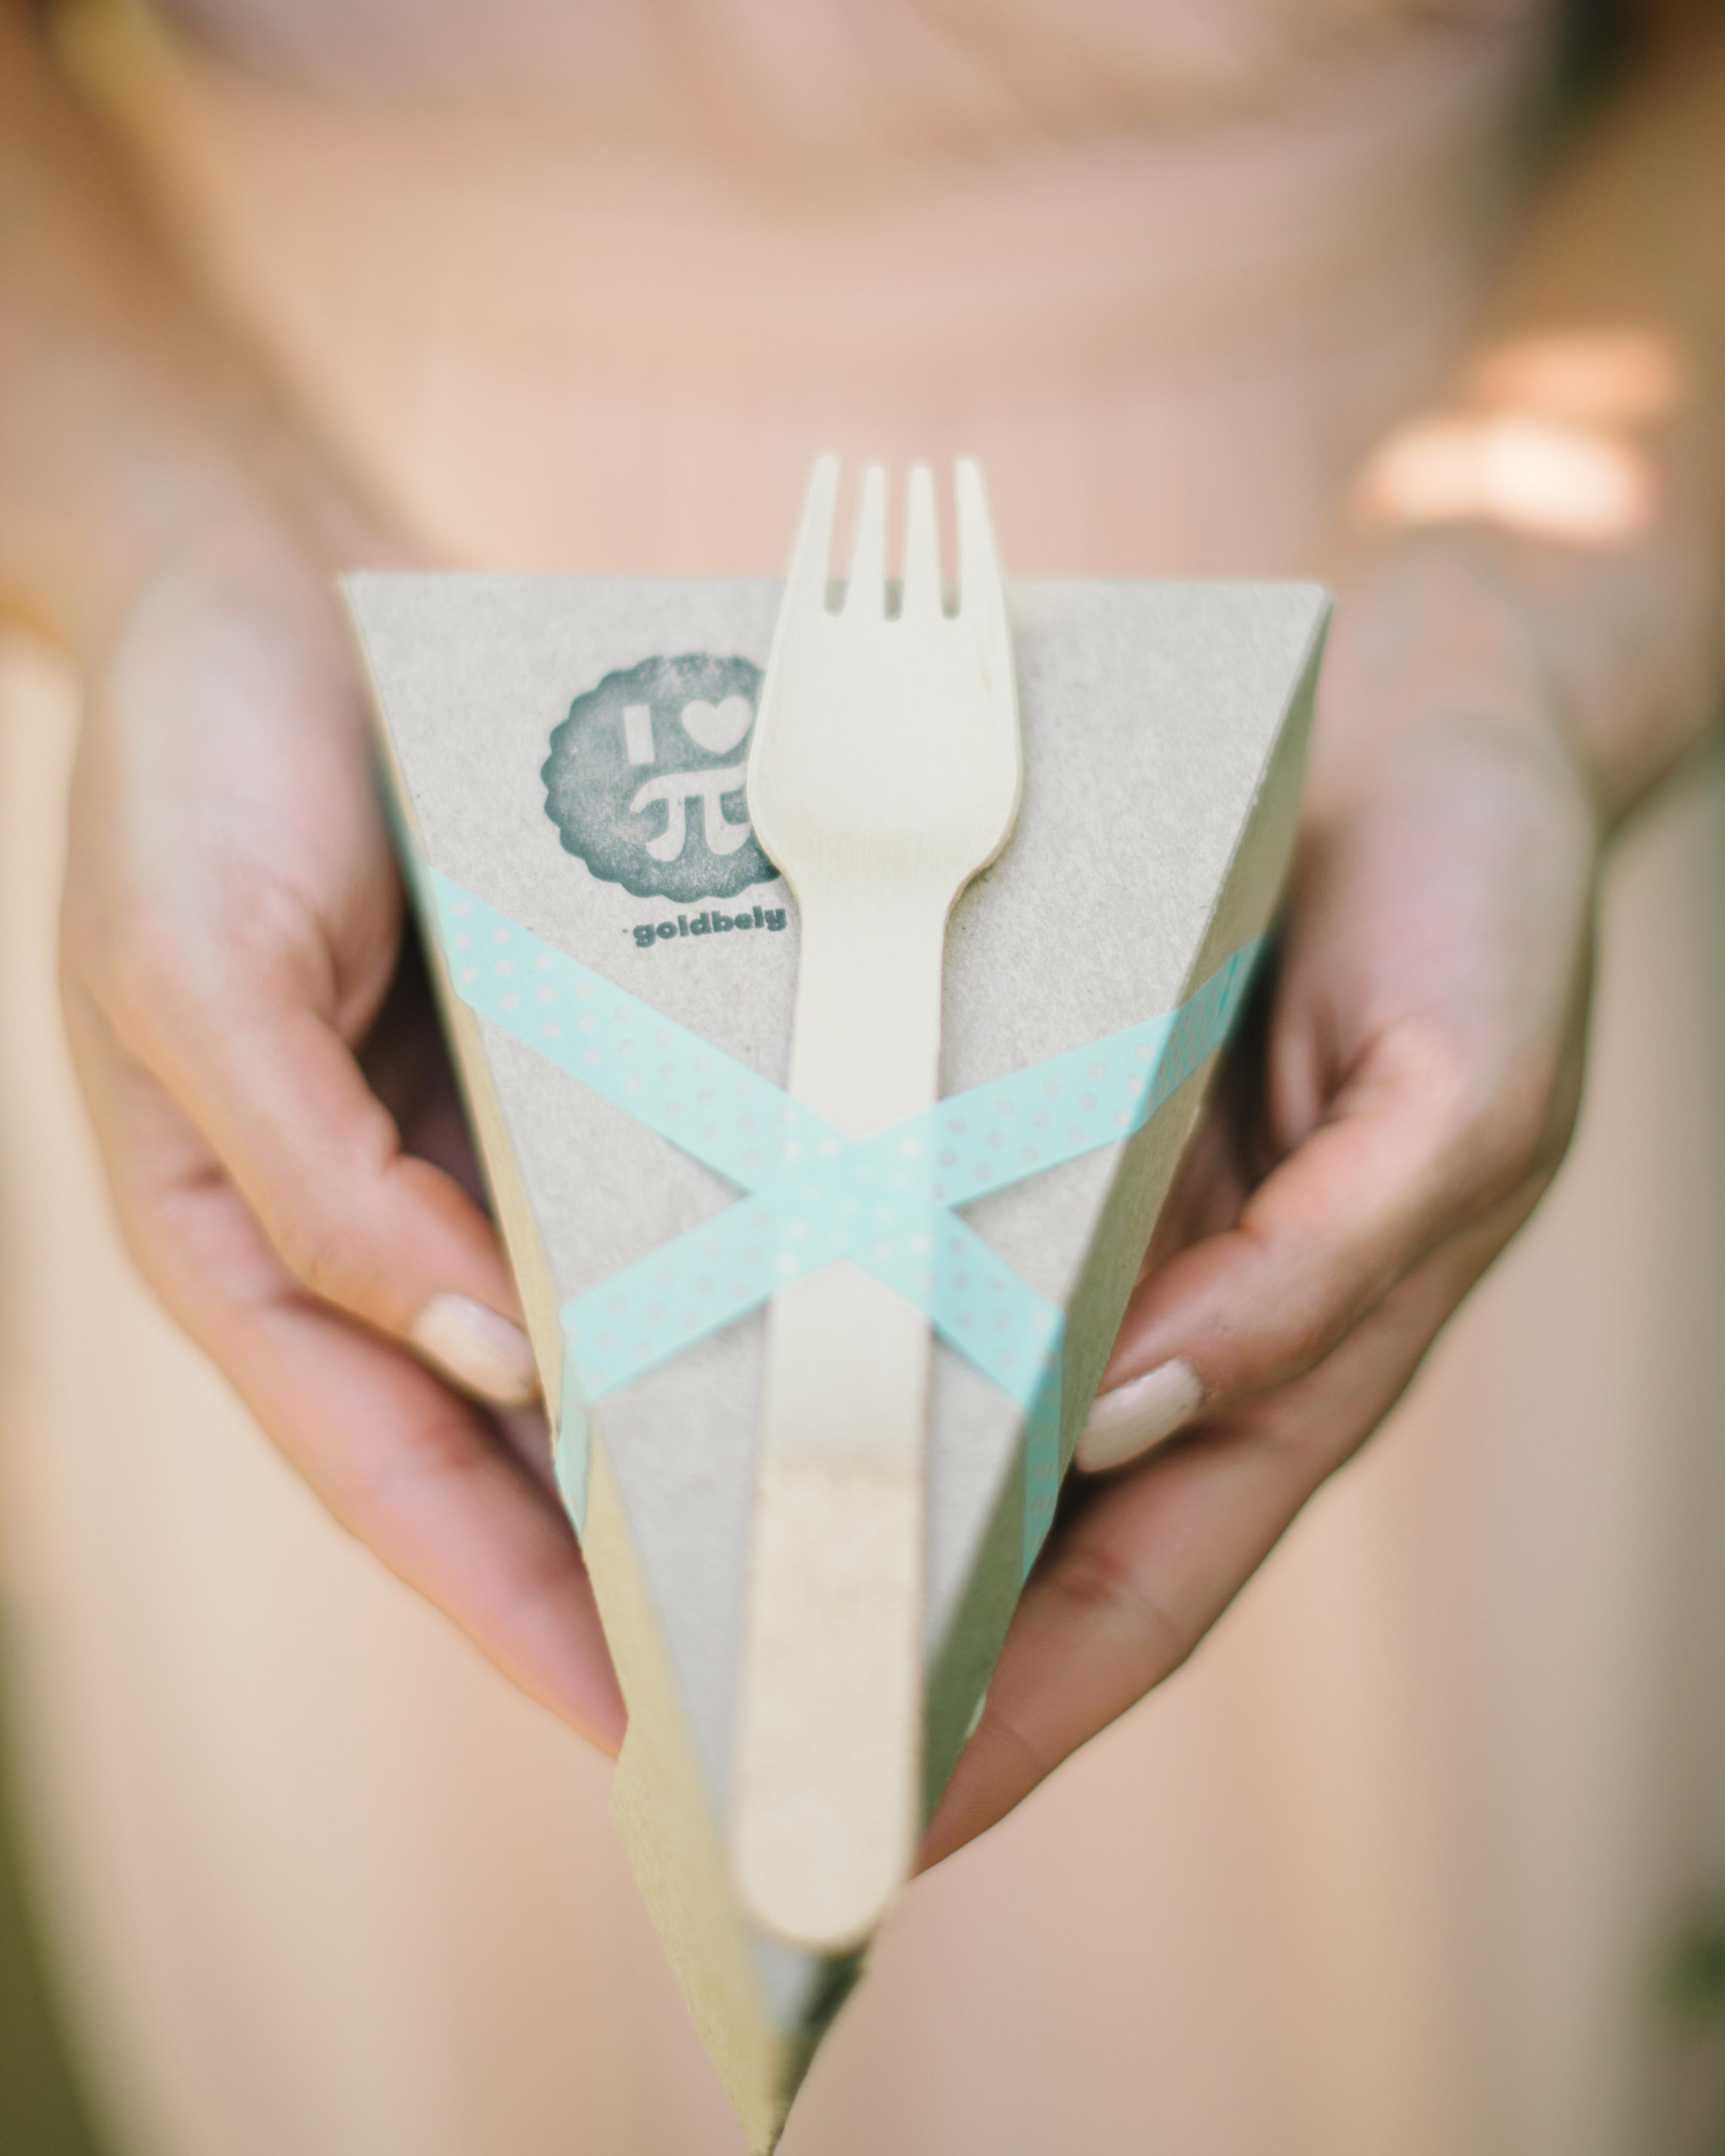 vanessa-joe-wedding-pie-8450-s111736-1214.jpg